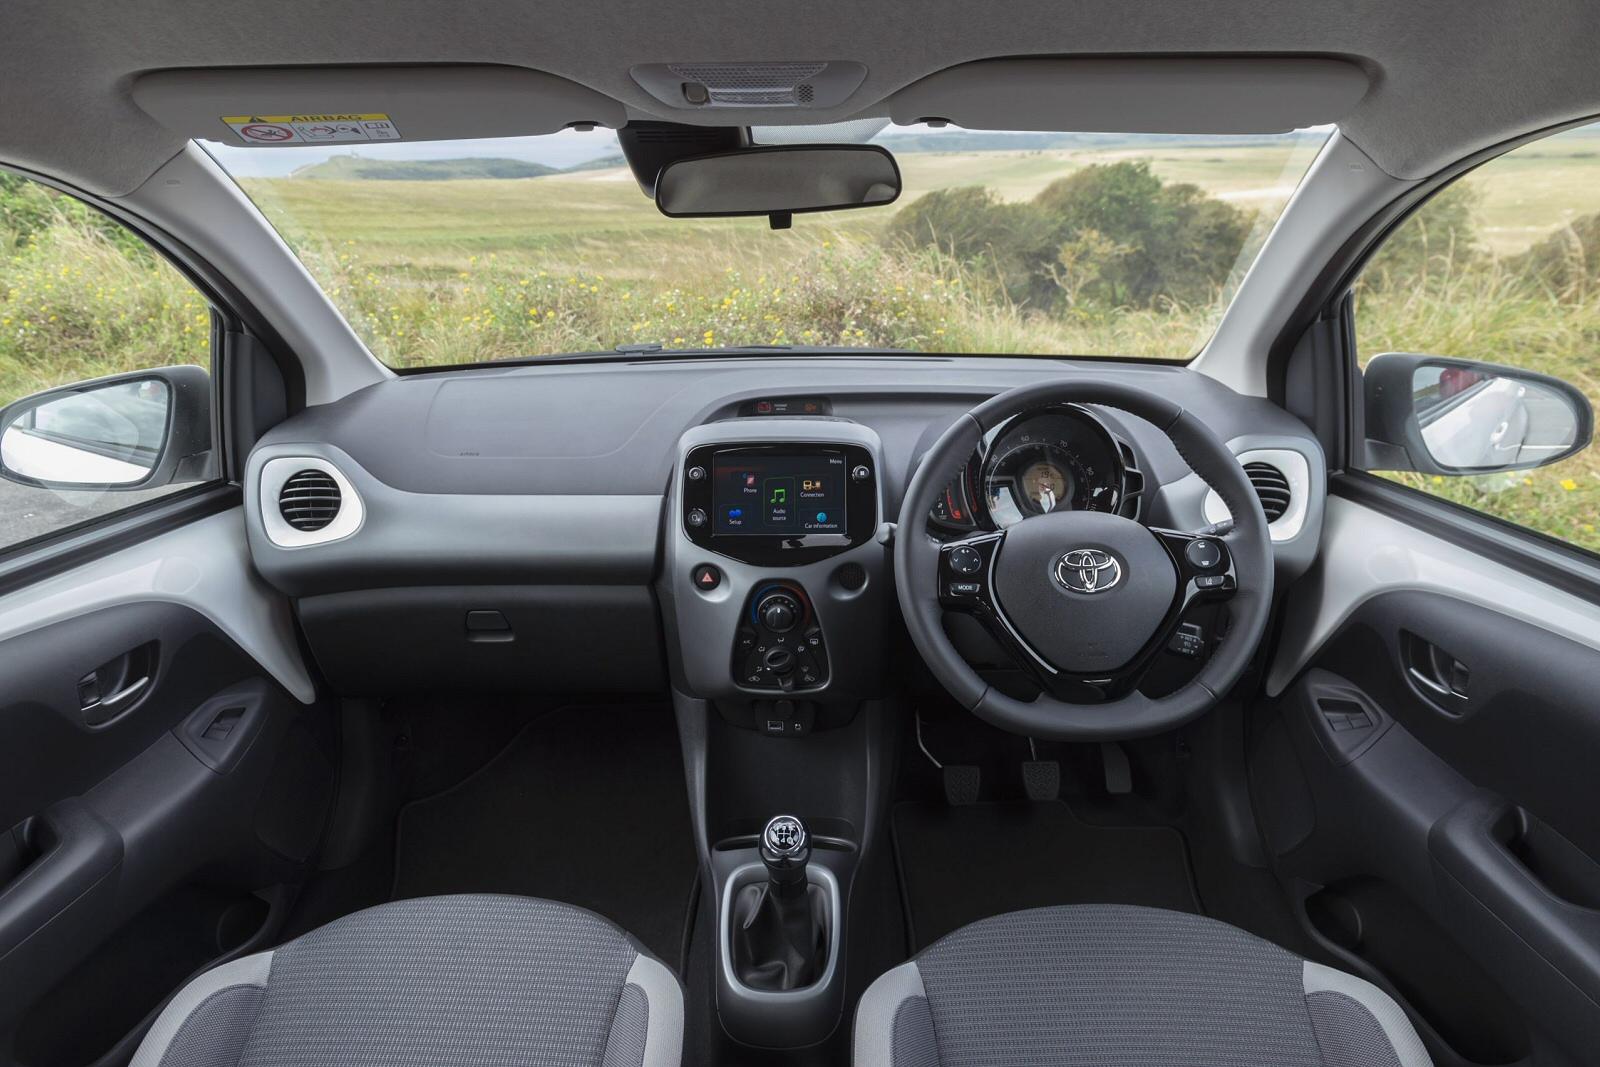 new toyota aygo 1 0 vvt i x play tss 5dr petrol hatchback motability vehicle for sale bristol. Black Bedroom Furniture Sets. Home Design Ideas